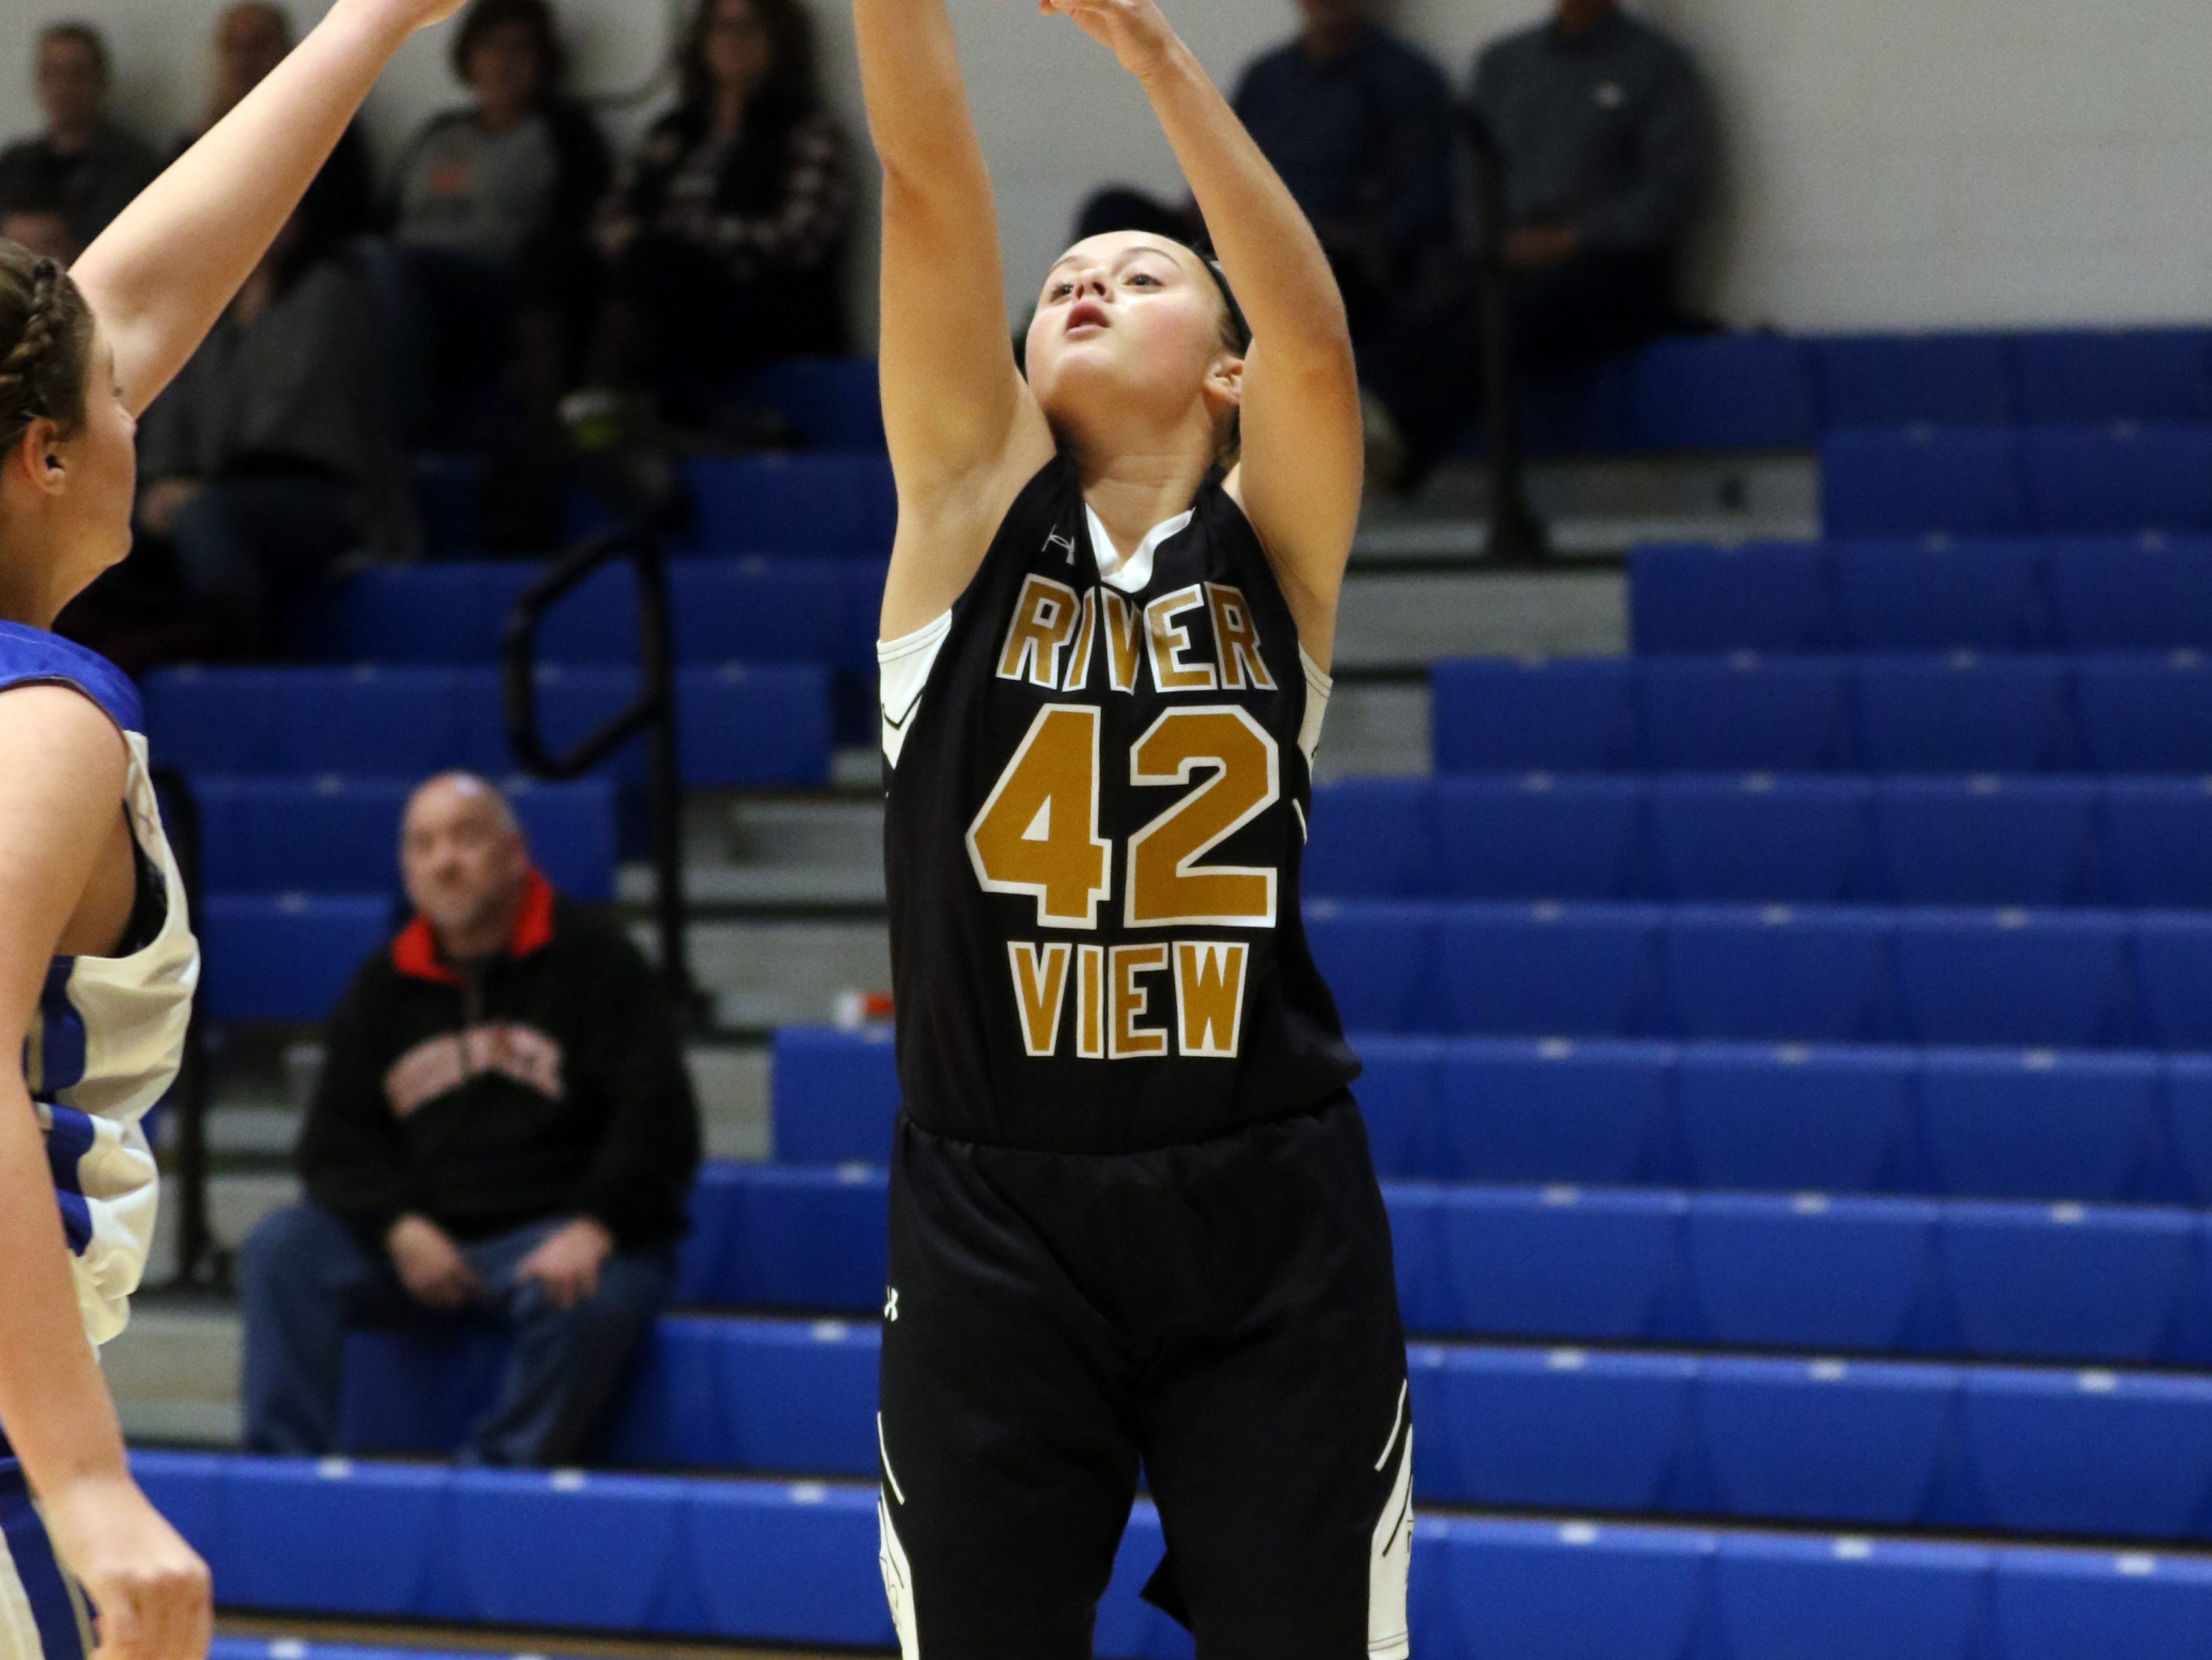 River View's Melanie Giffin puts up a shot against Zanesville.